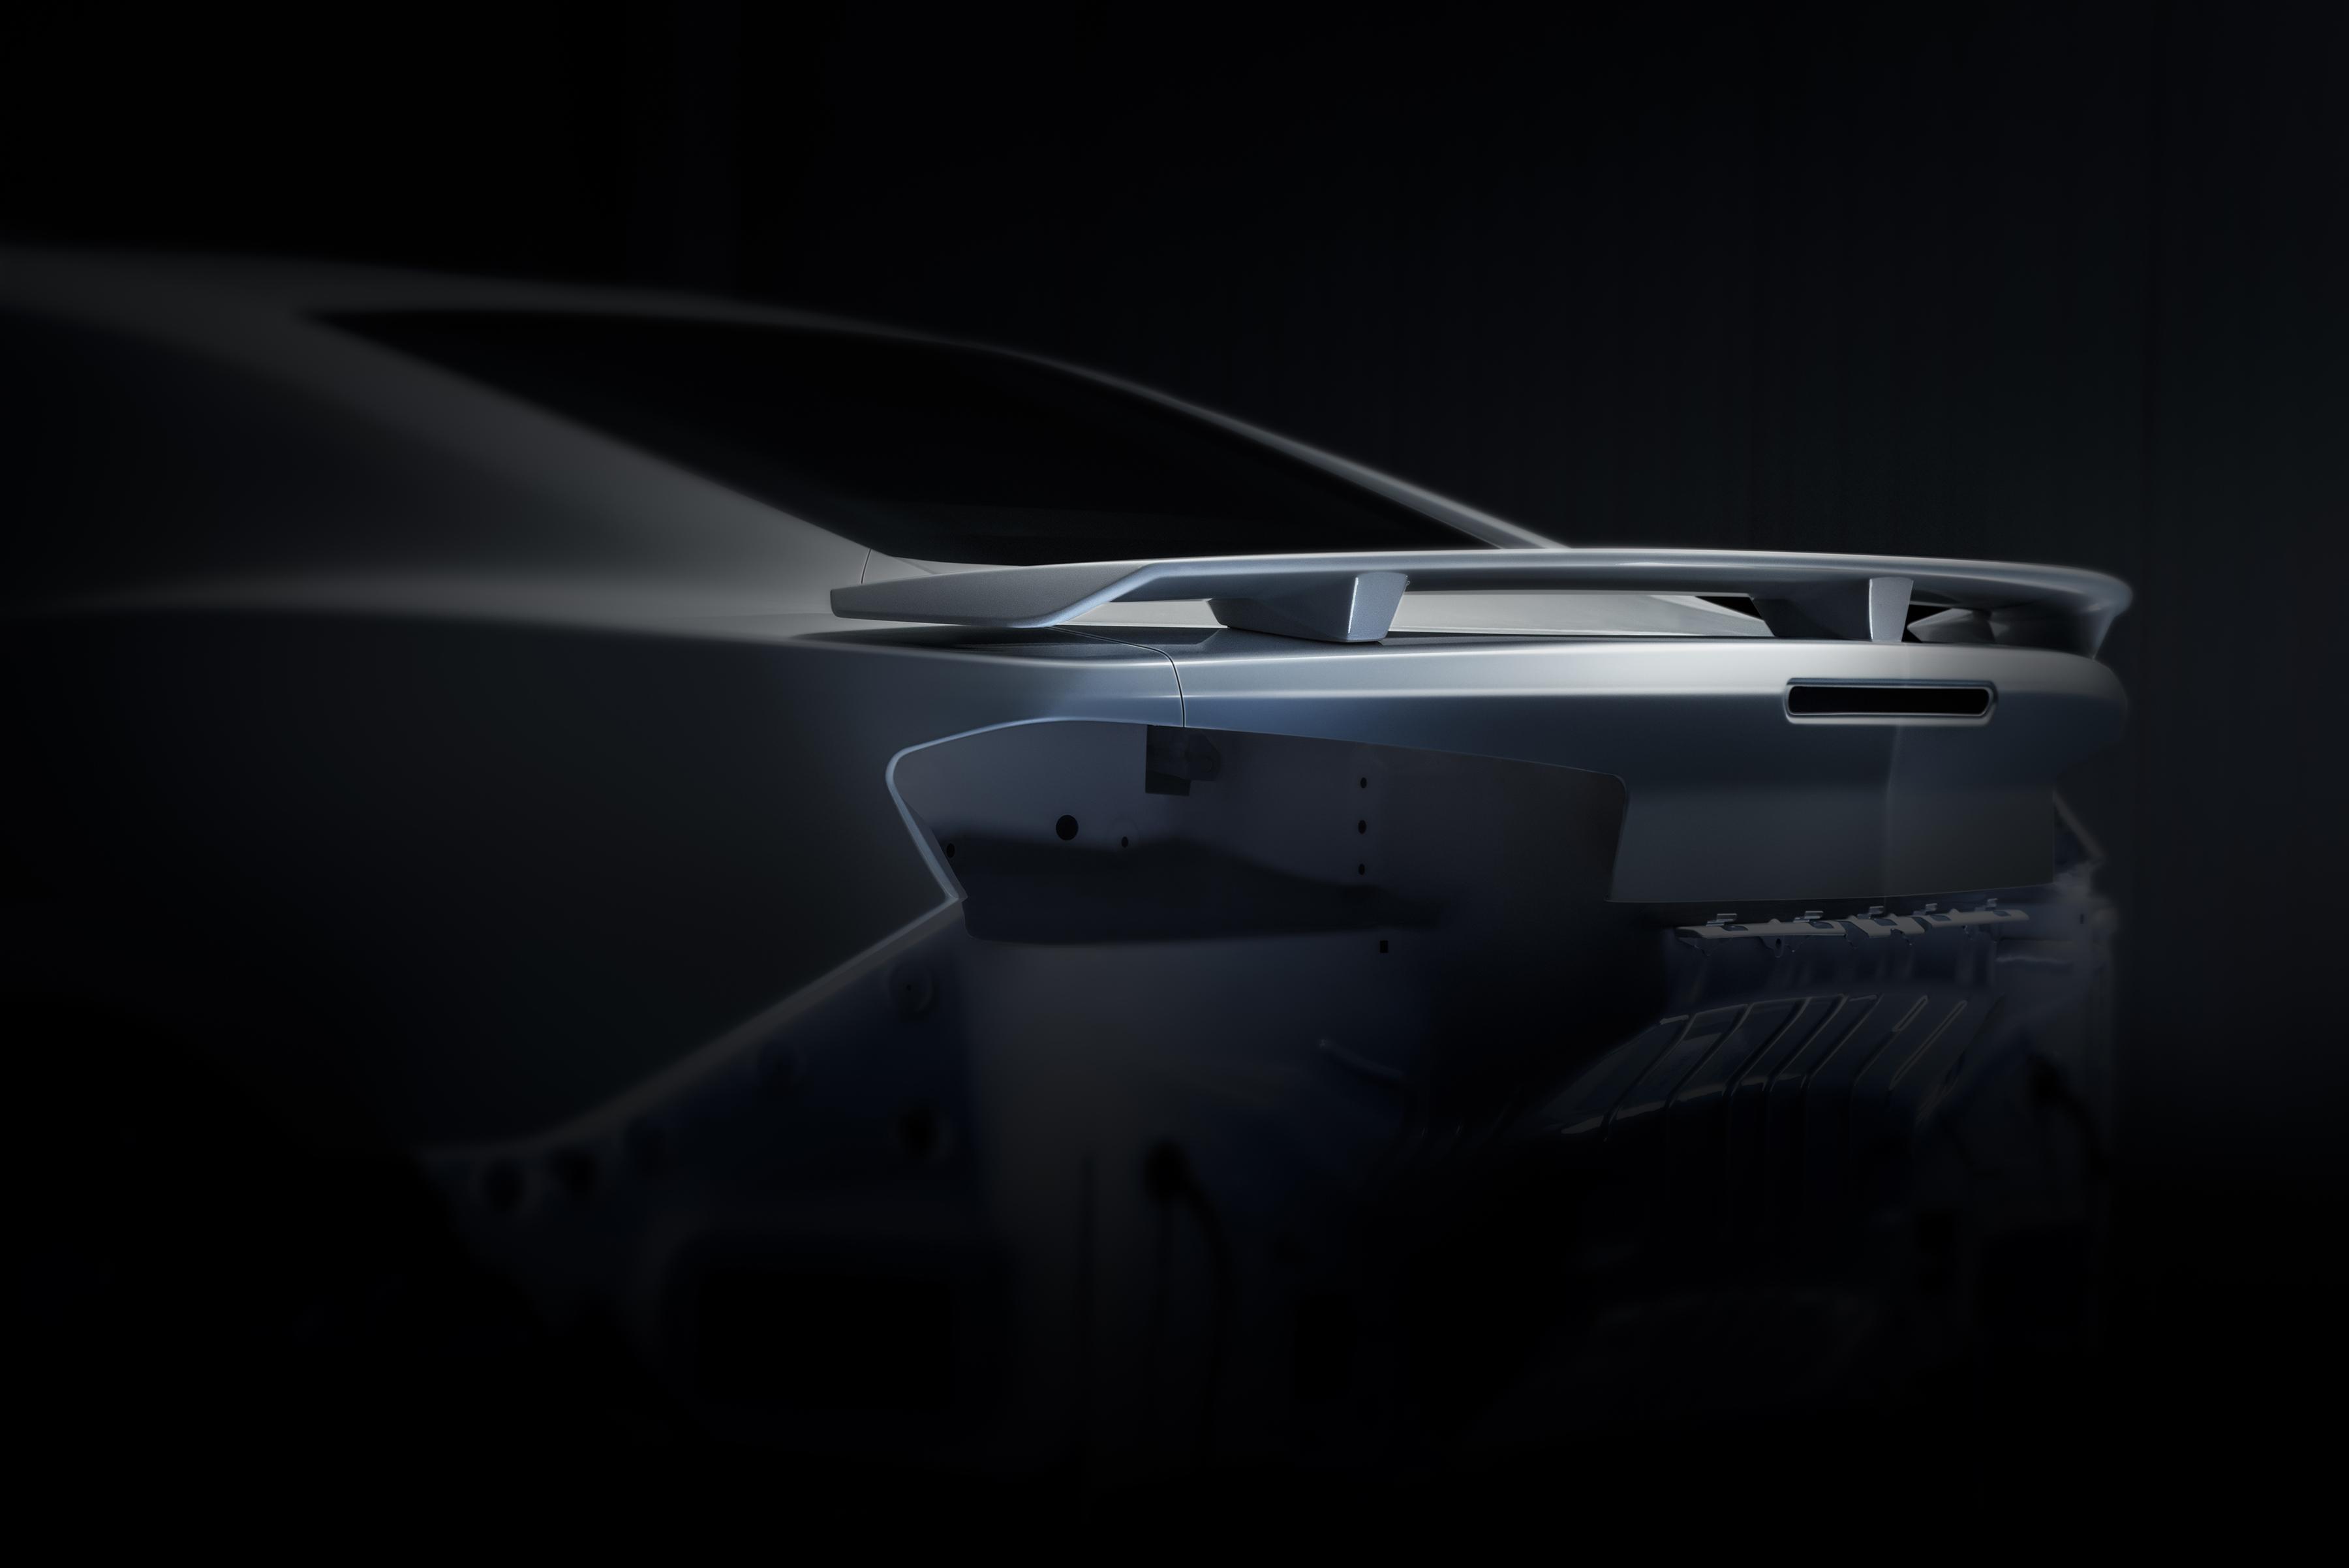 2016 Chevrolet Camaro - rear / arrière (teaser)